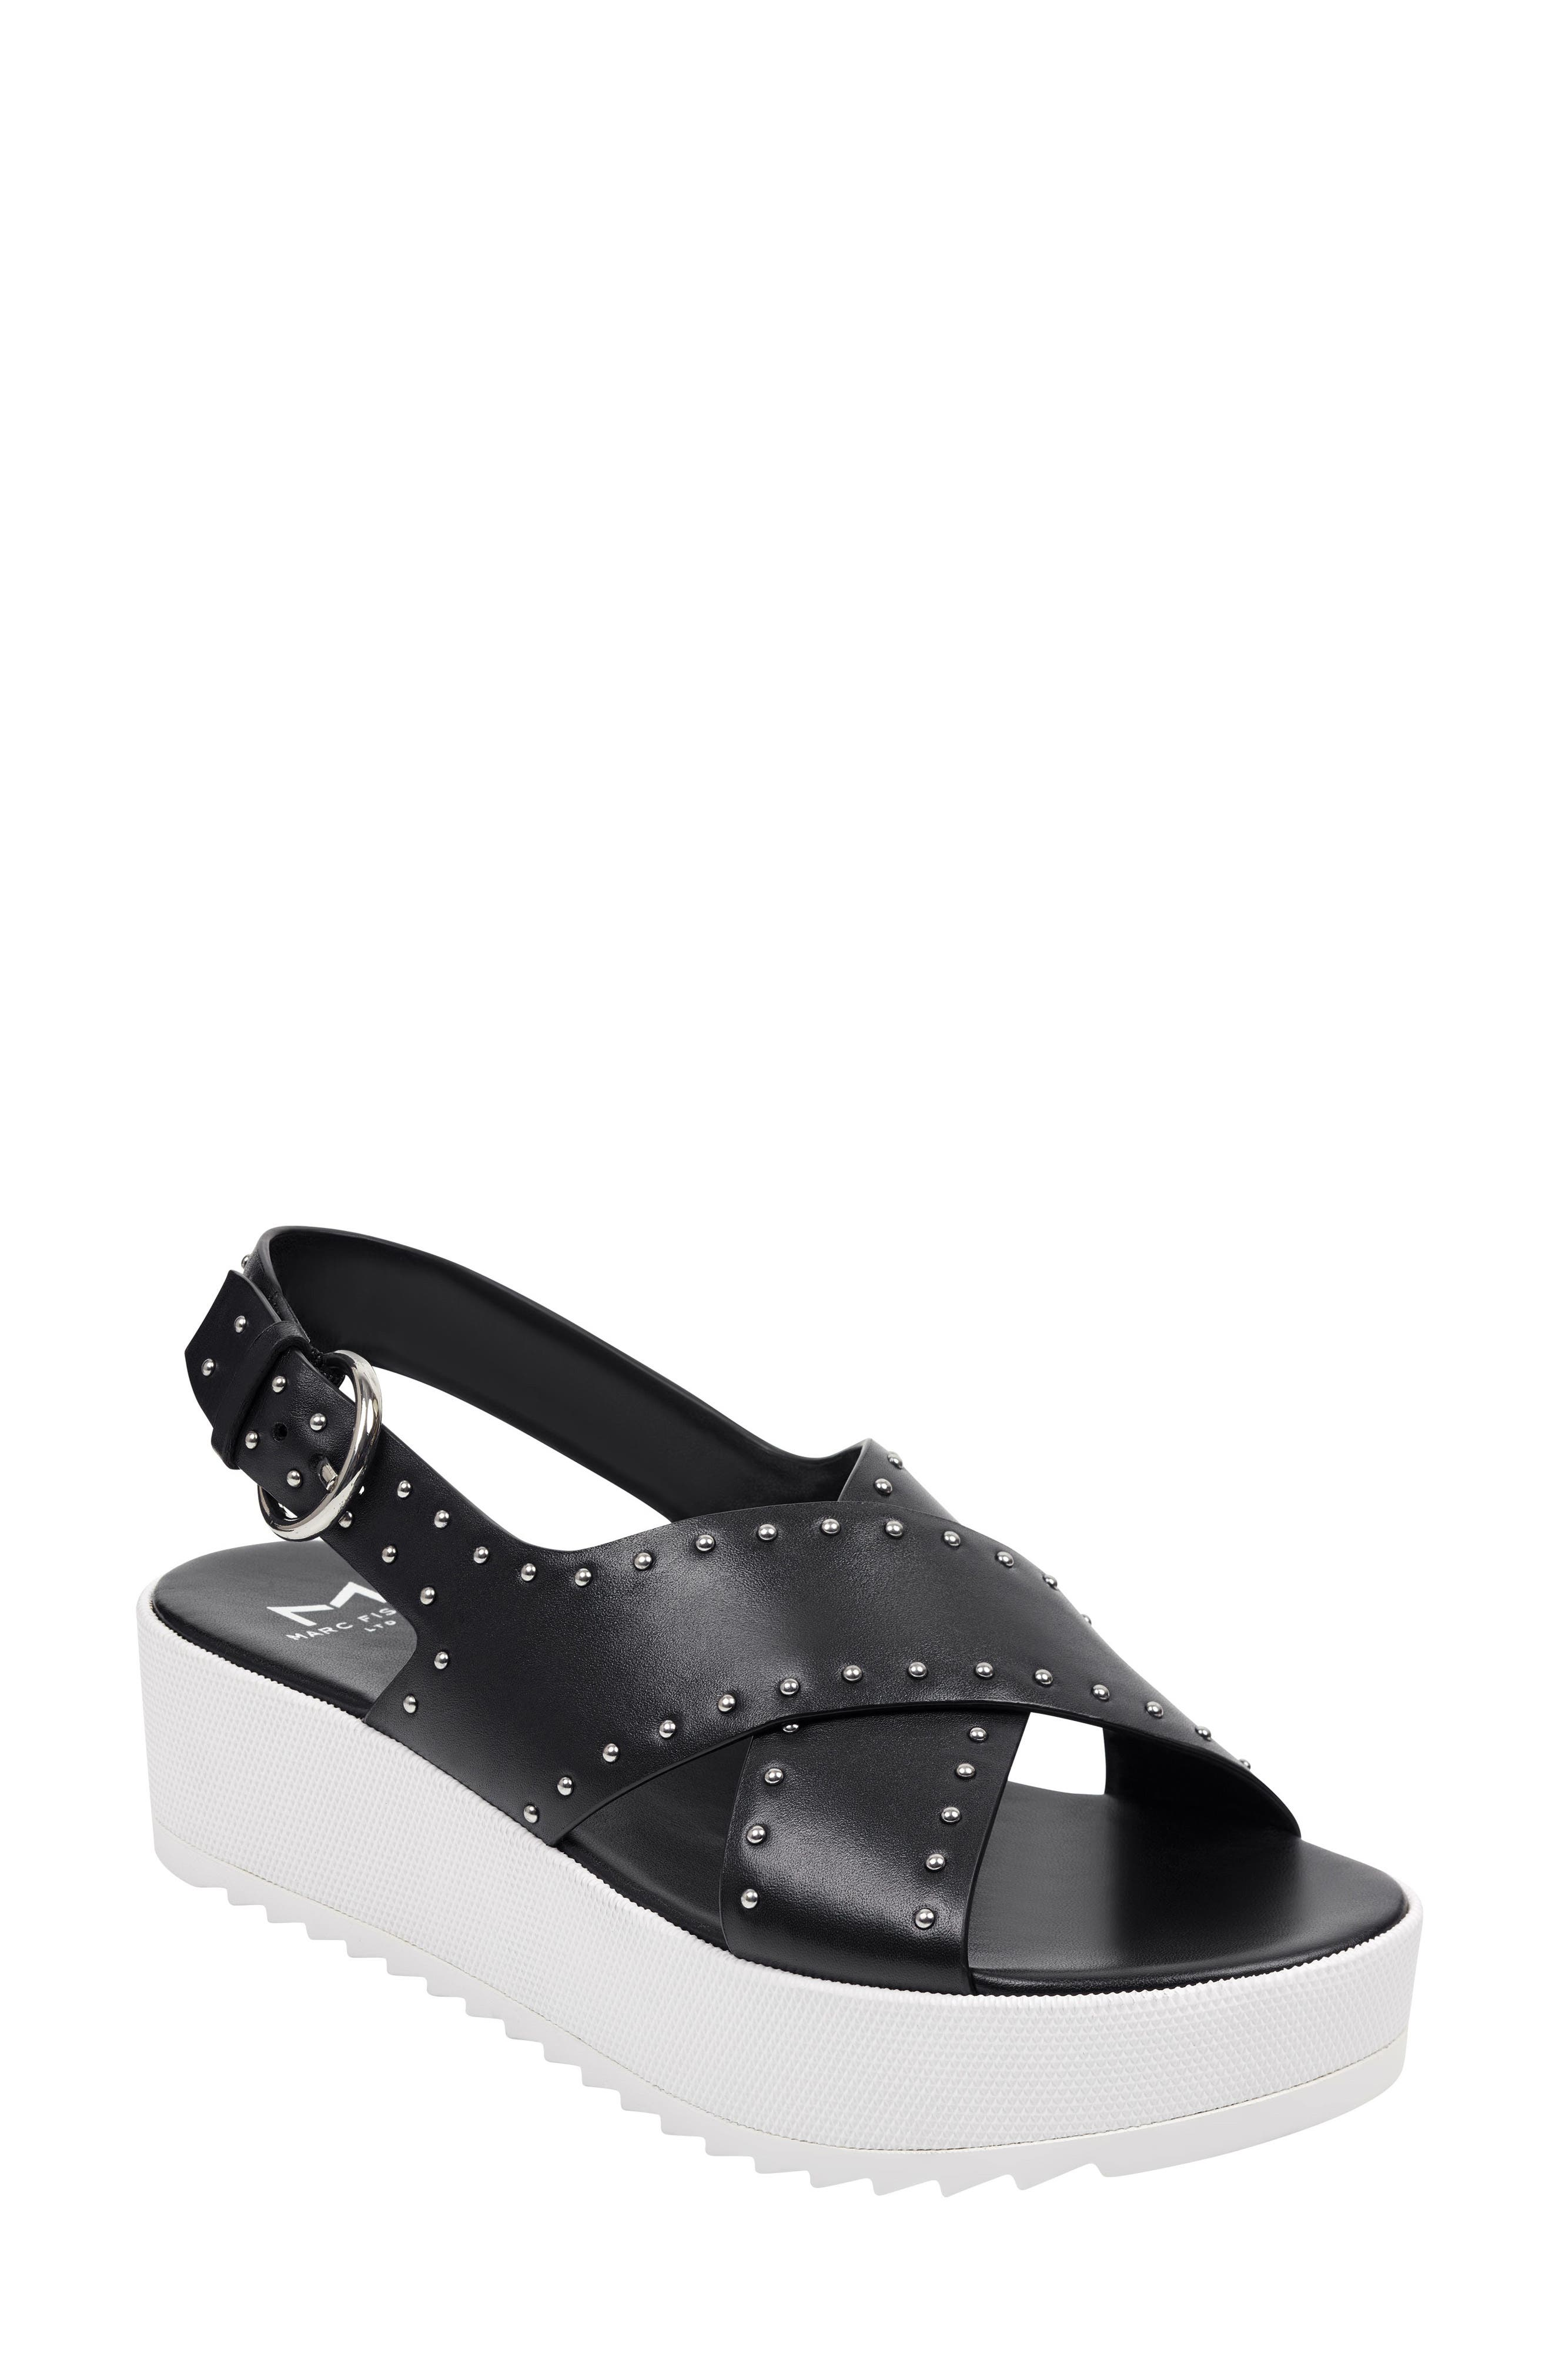 Marc Fisher Ltd Delilah Slingback Sandal, Black